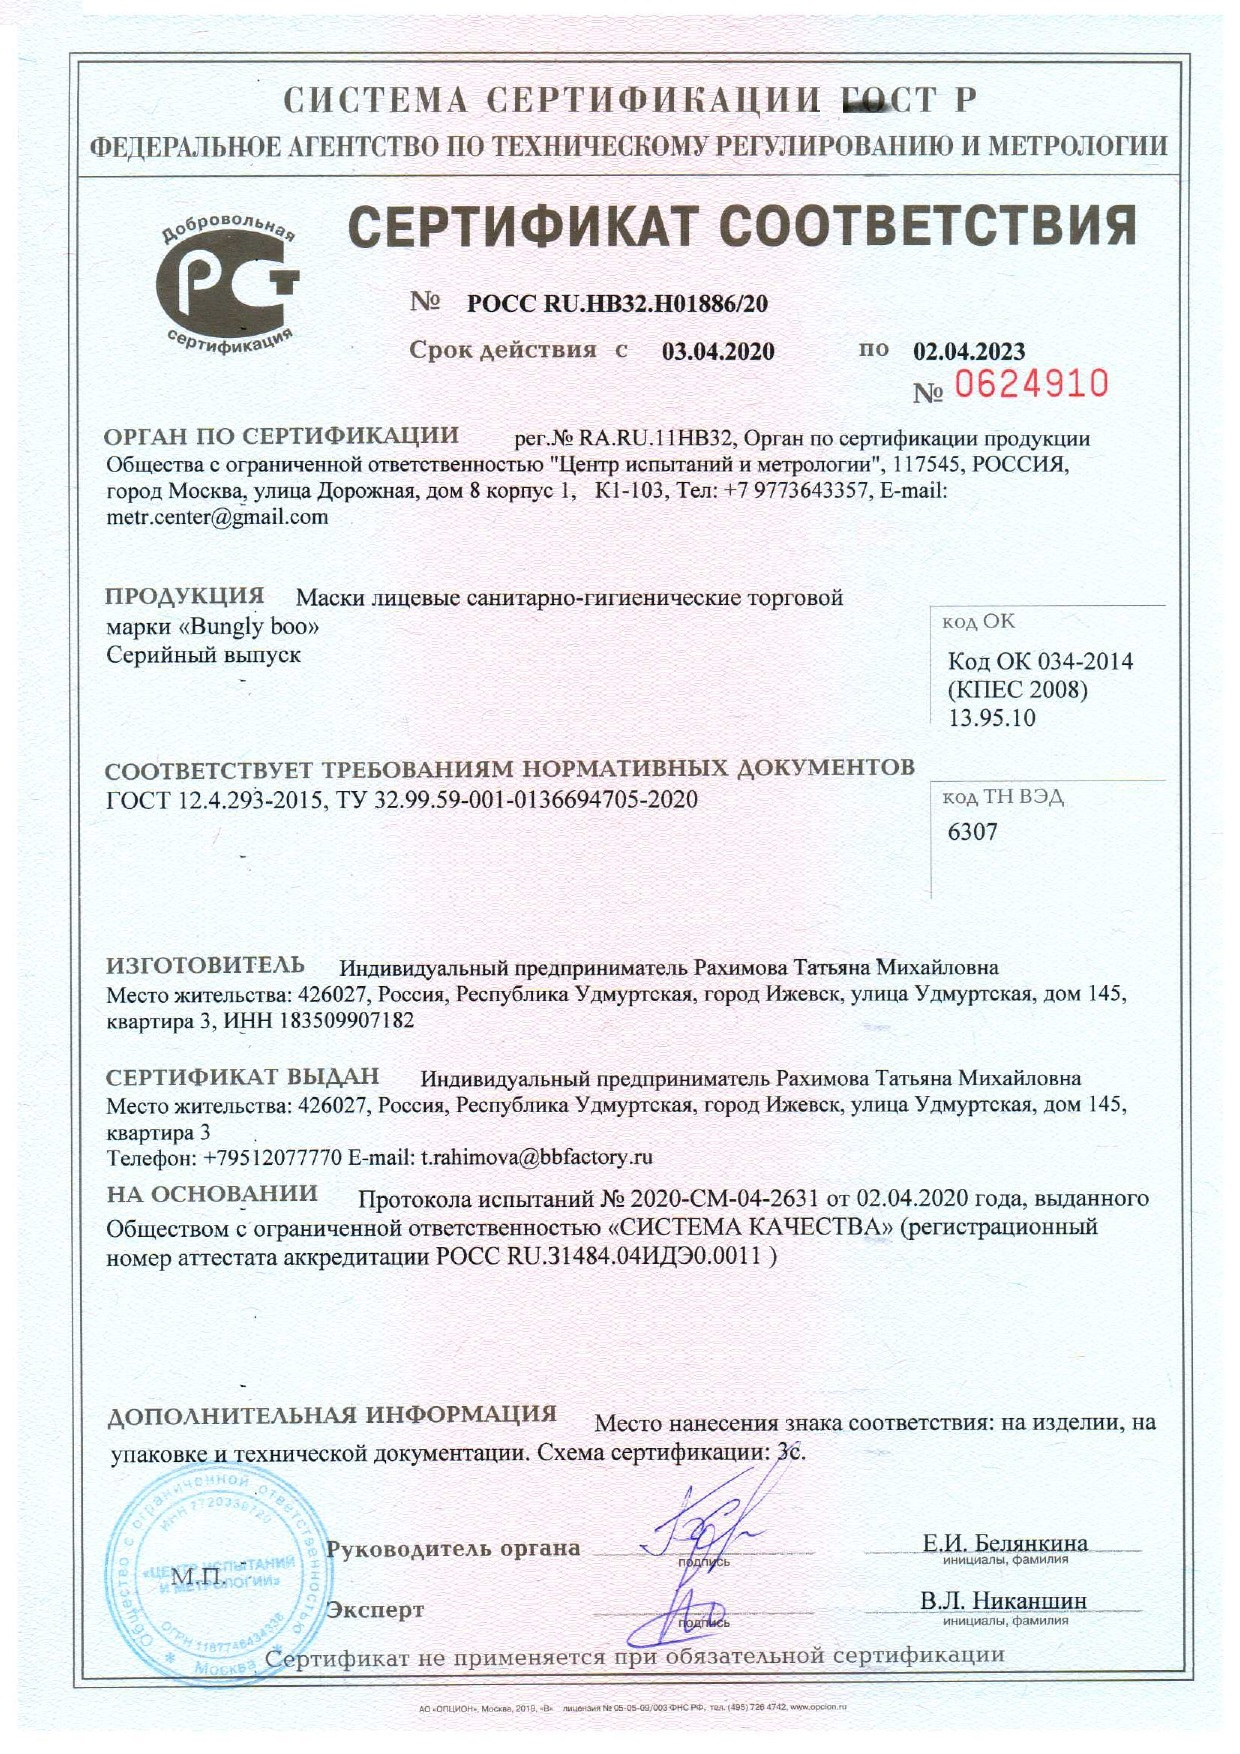 Сертификат соответствия на маски